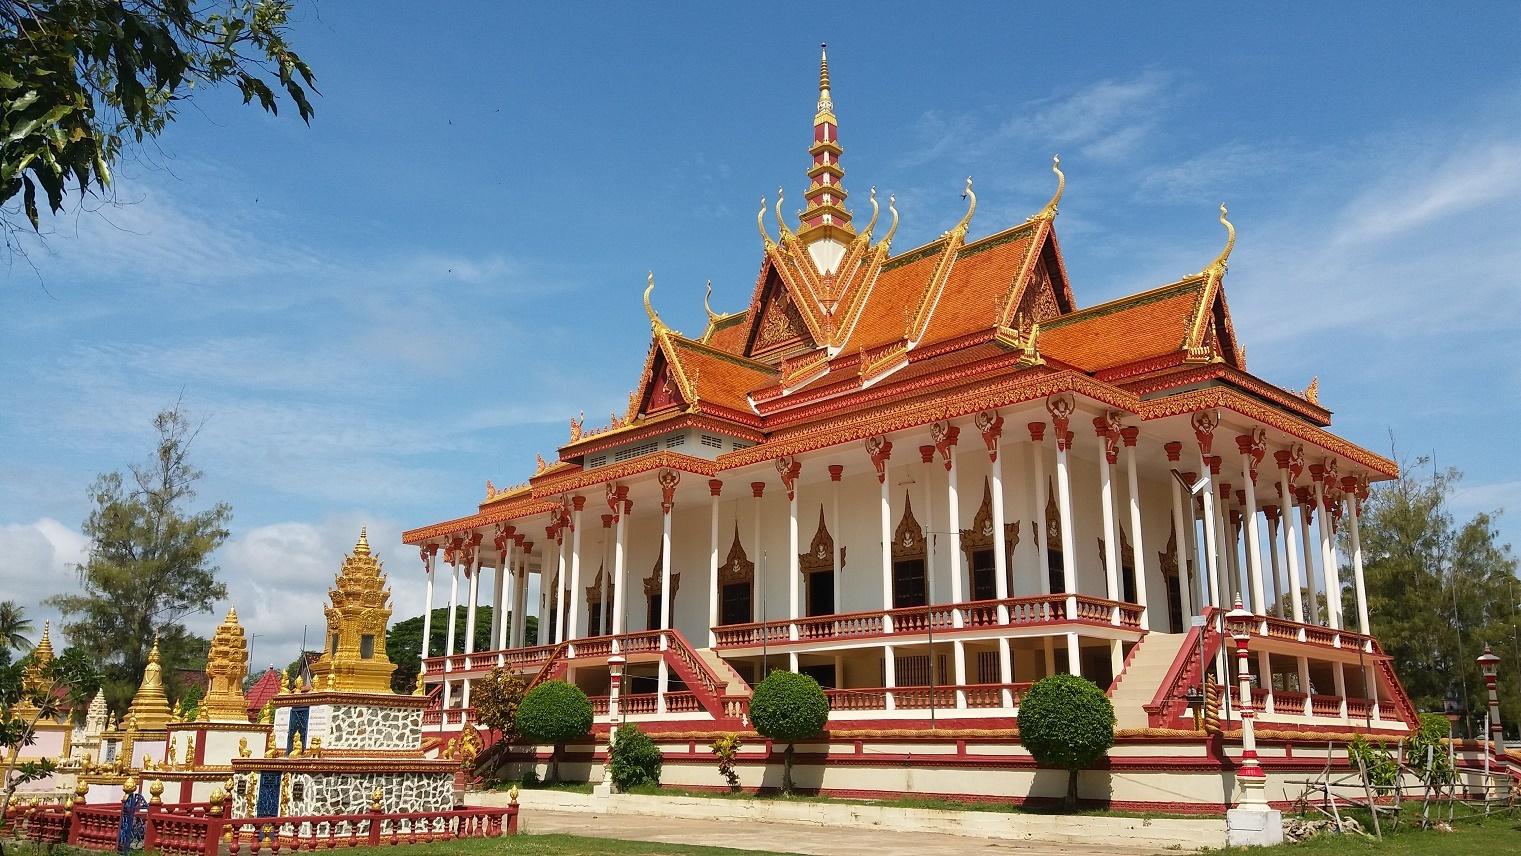 Chrám sta pilířů Kambodža